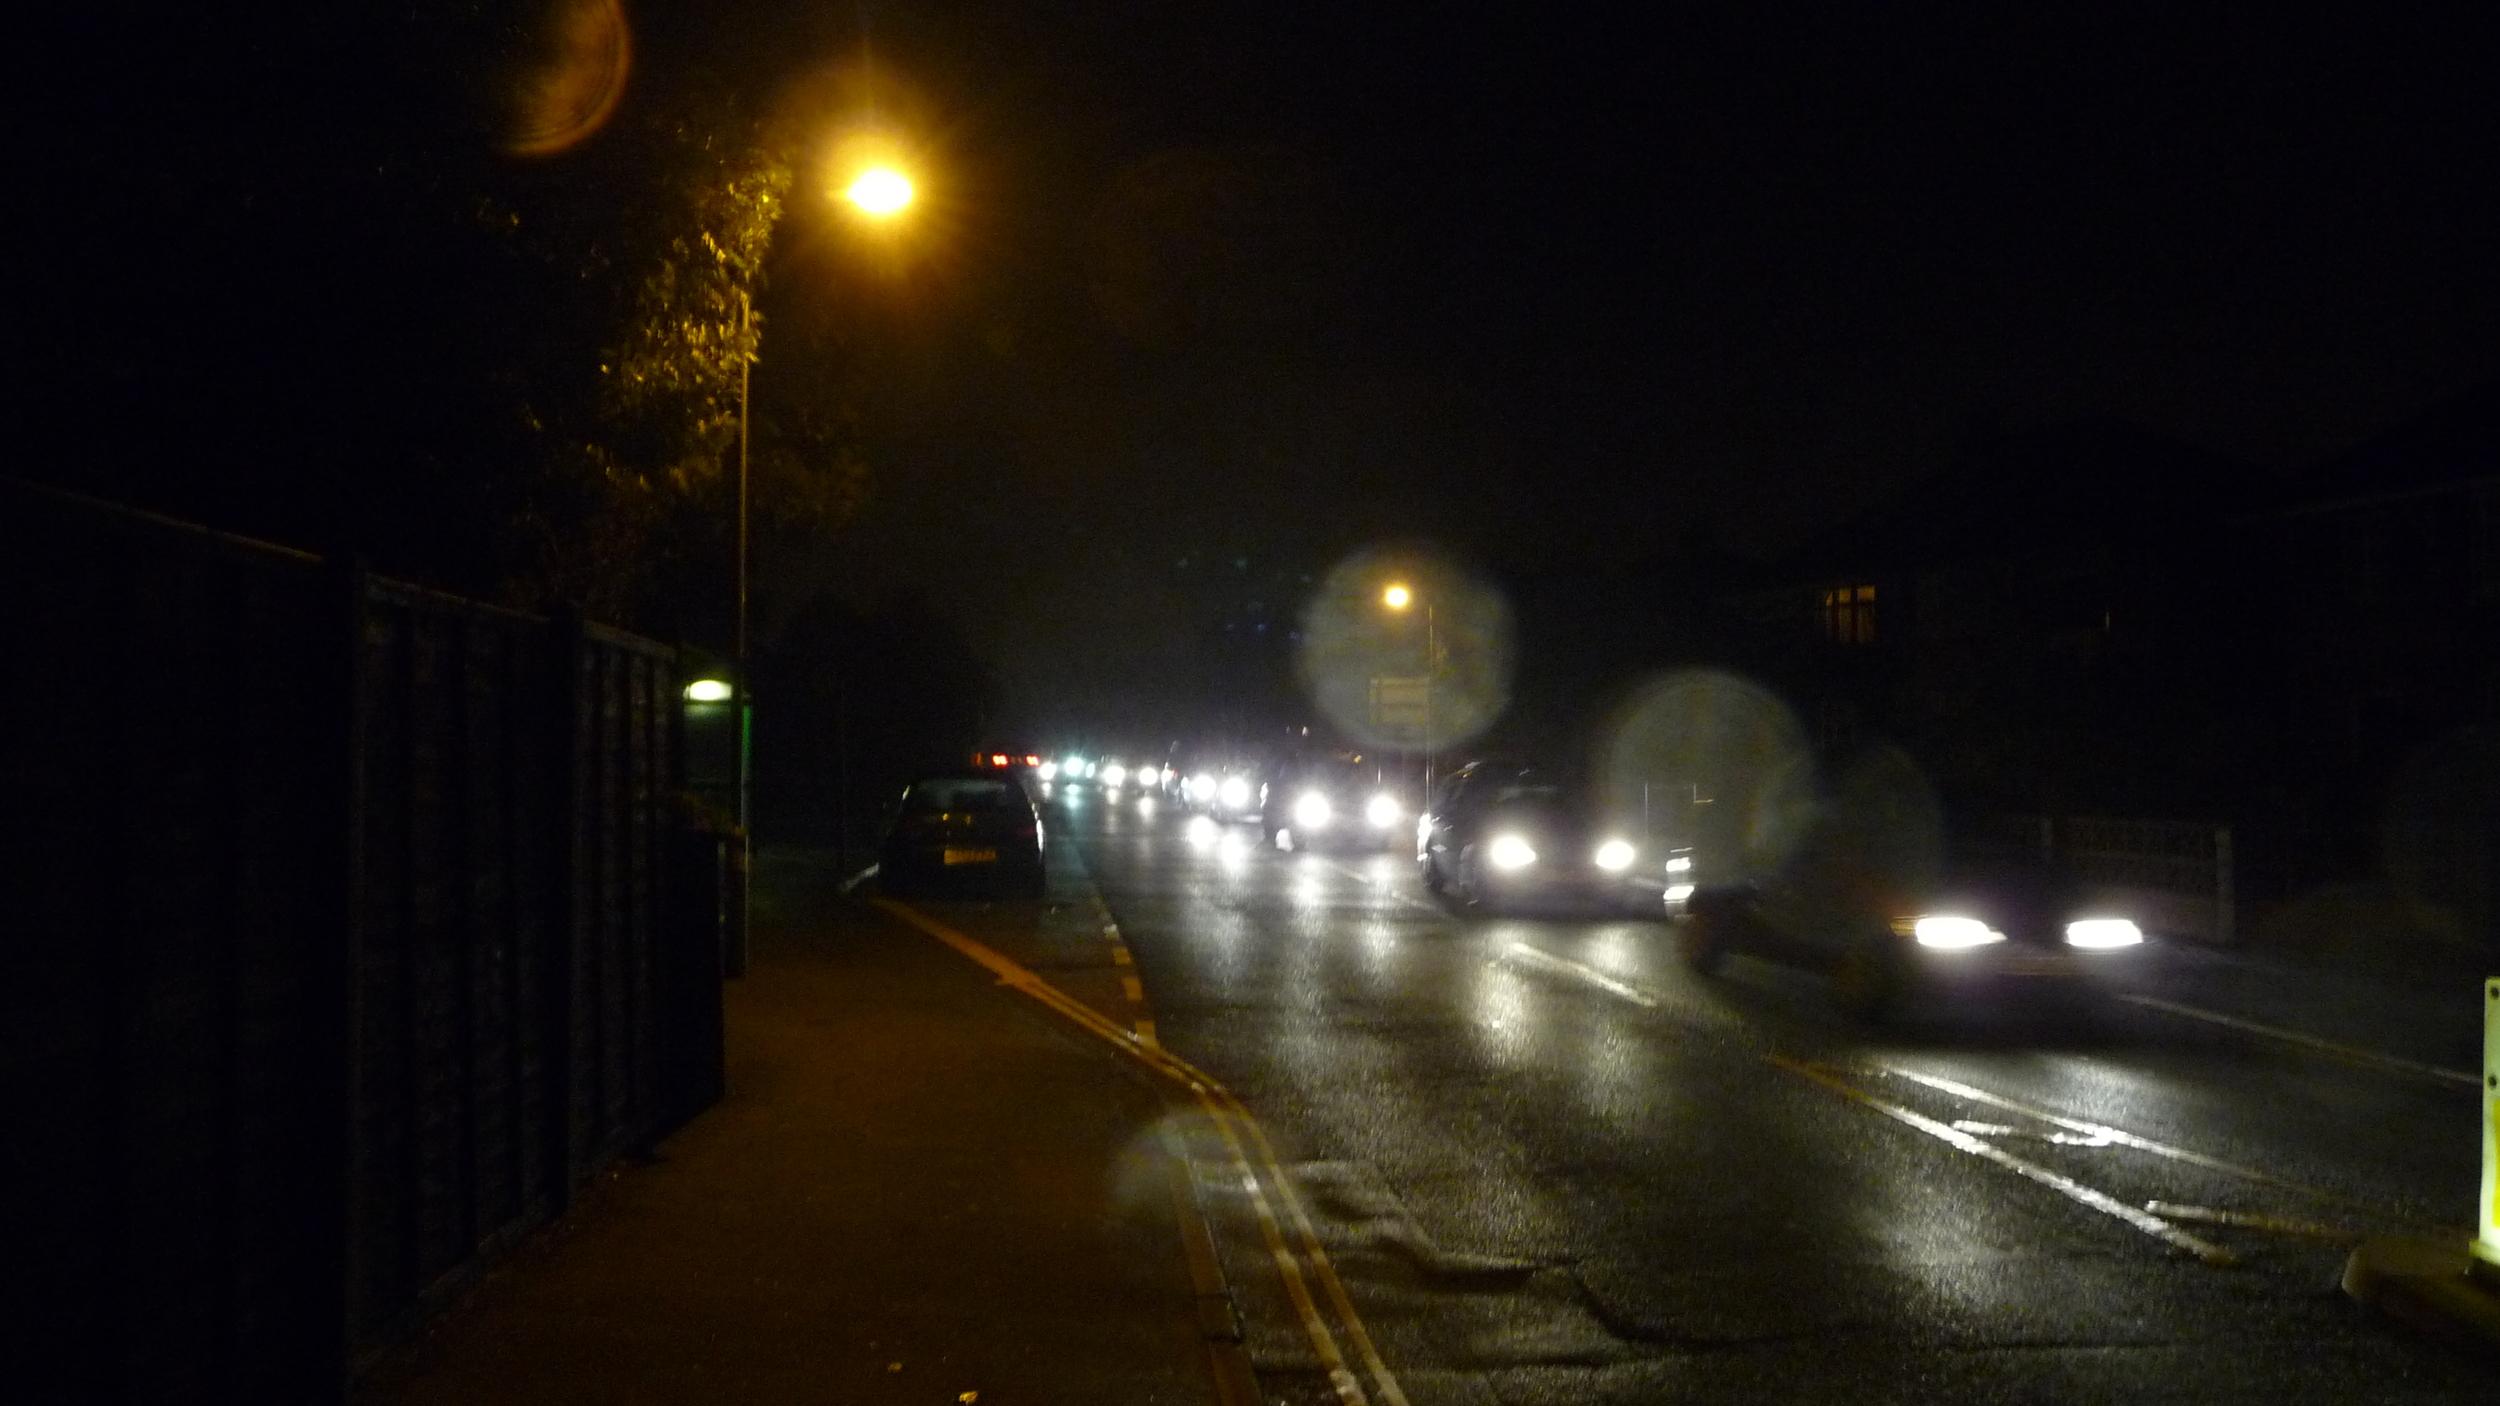 Cowes_Park_Road_traffic_on_Firework_Night_2010_2.JPG